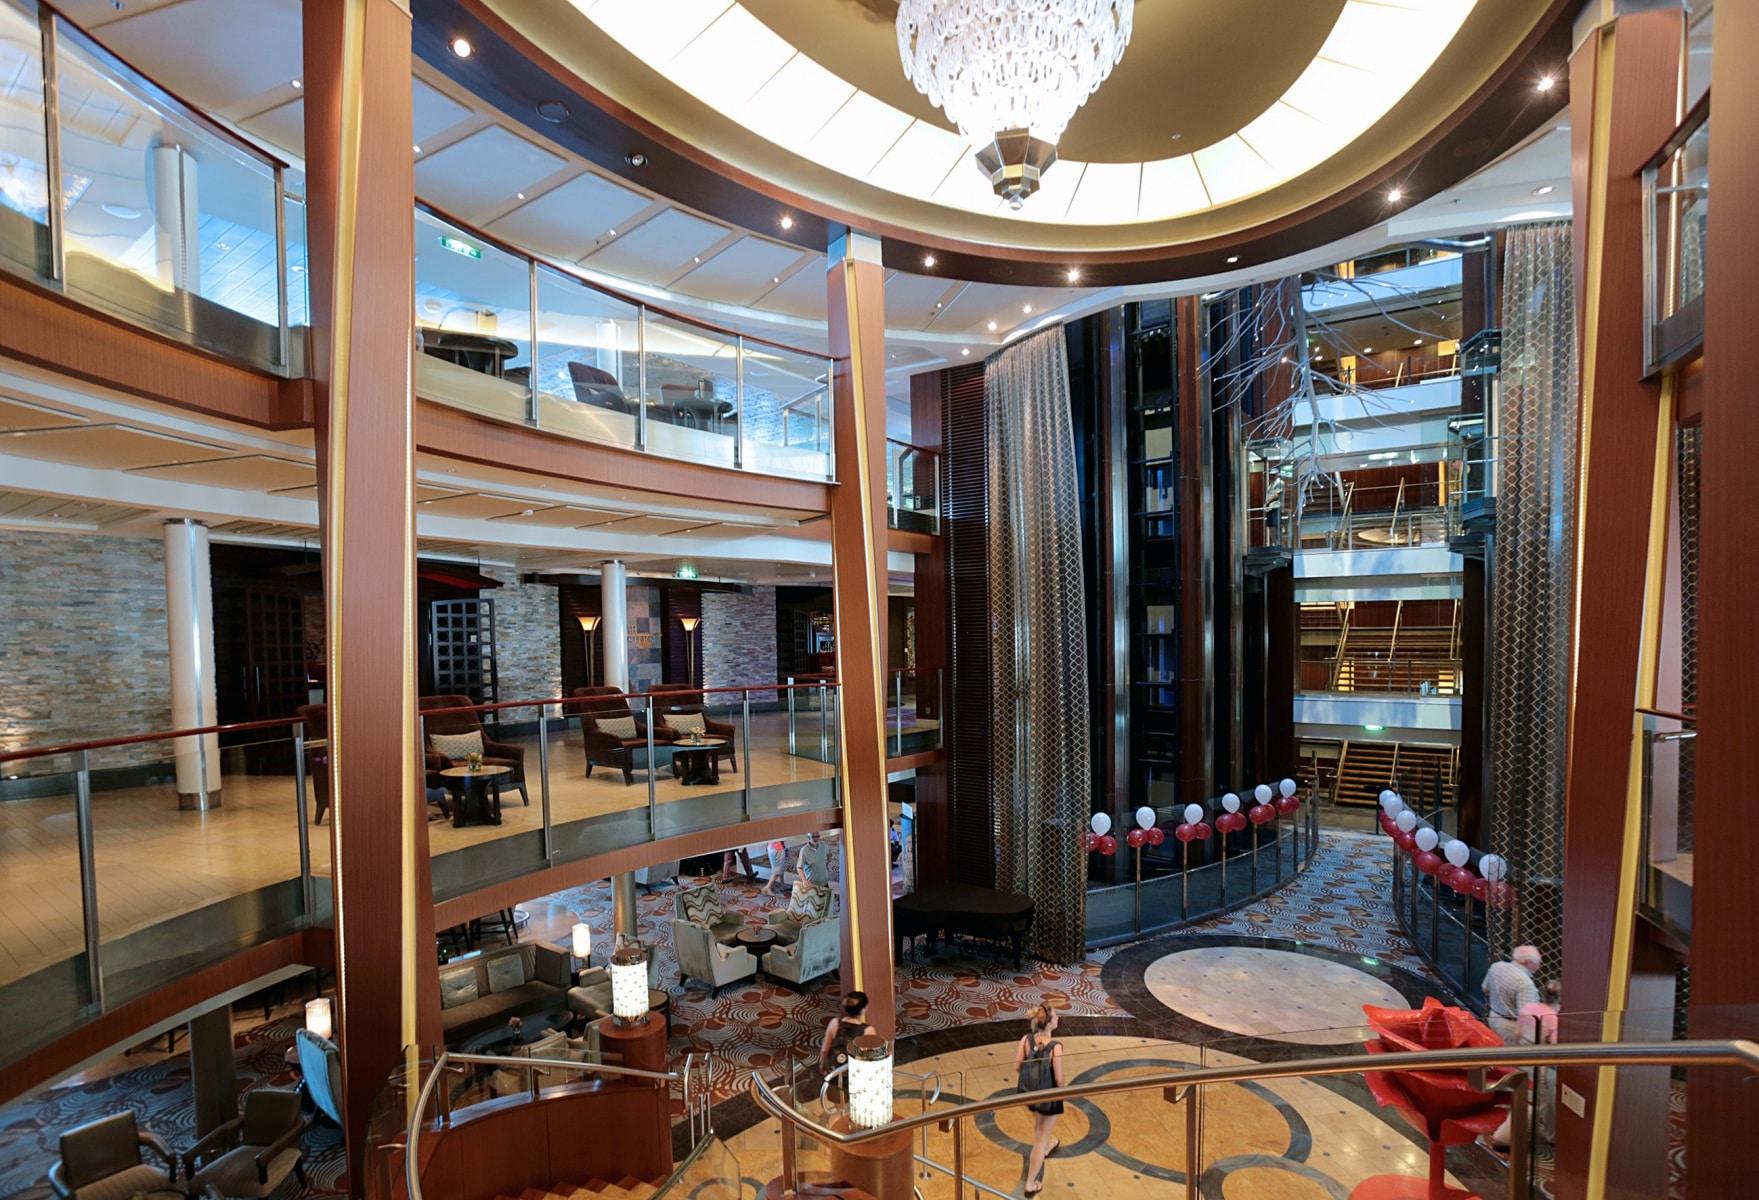 08-may-2017-7visita-inaugural-del-crucero-celebrity-or-reflection-a-gibraltar_34737775245_o